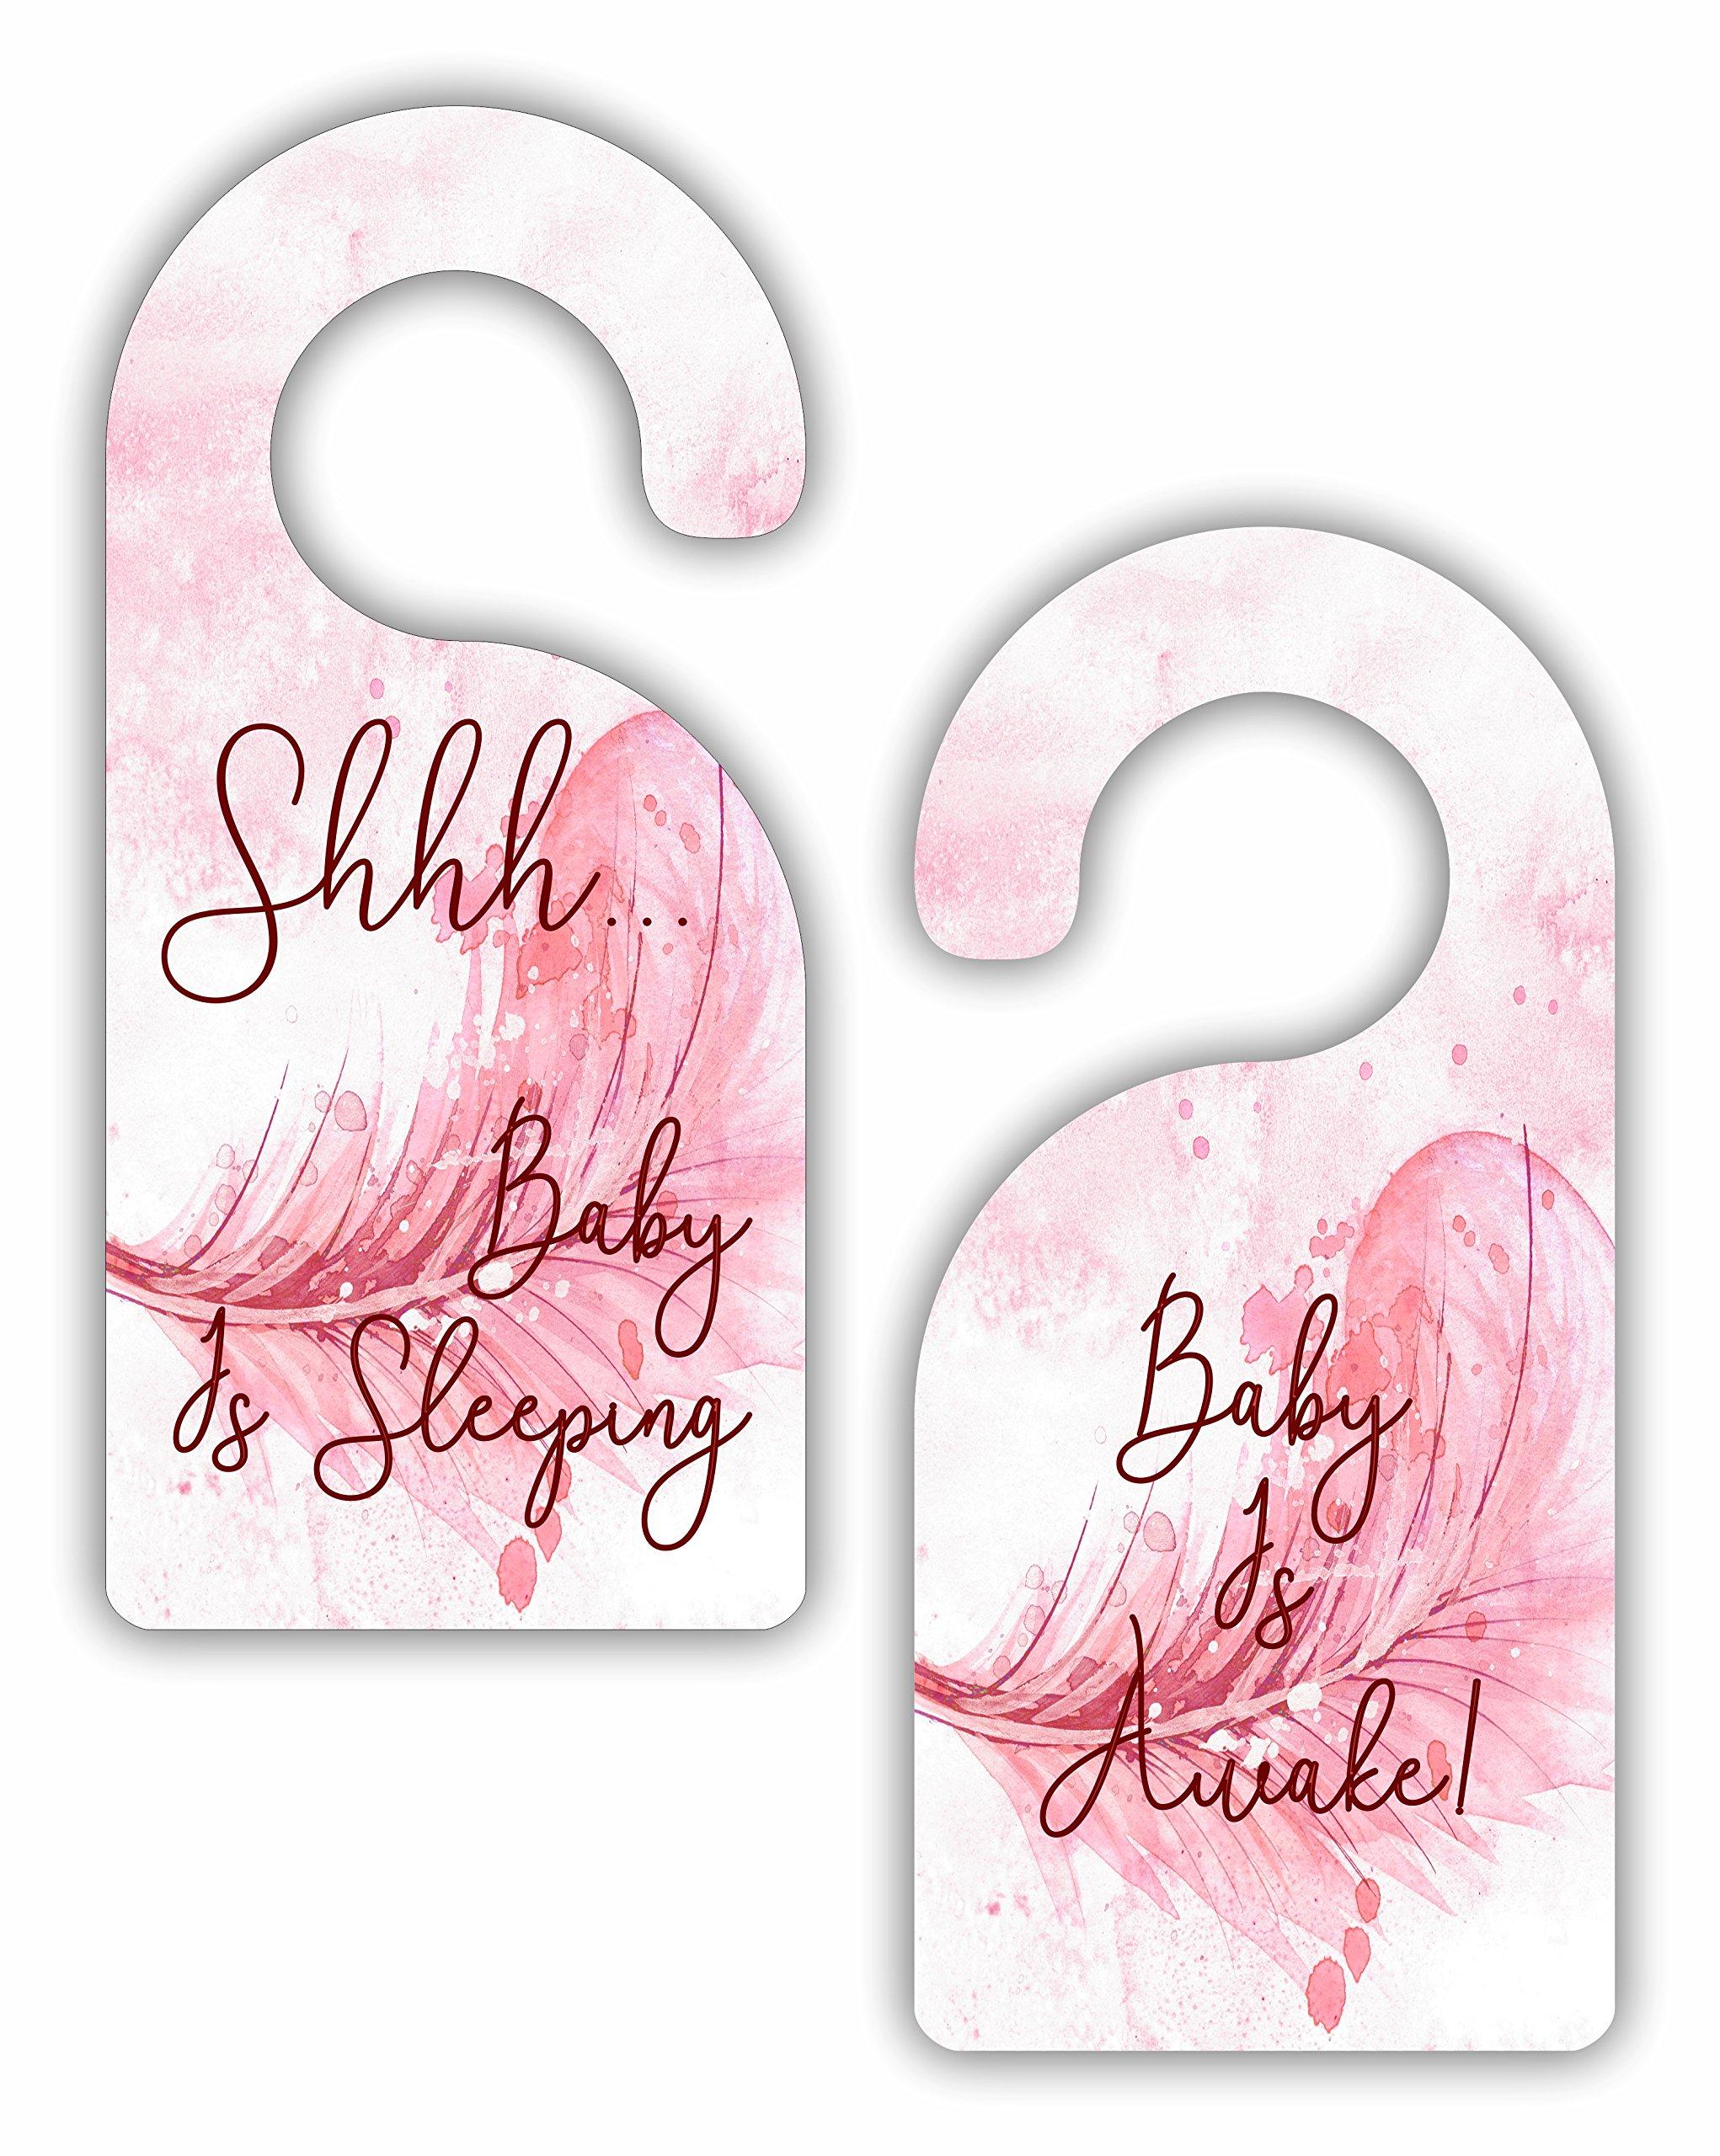 Shhh Baby is Sleeping - Baby is Awake! - Girls Nursery Room Door Sign Hanger - Double Sided - Hard Plastic - Glossy Finish